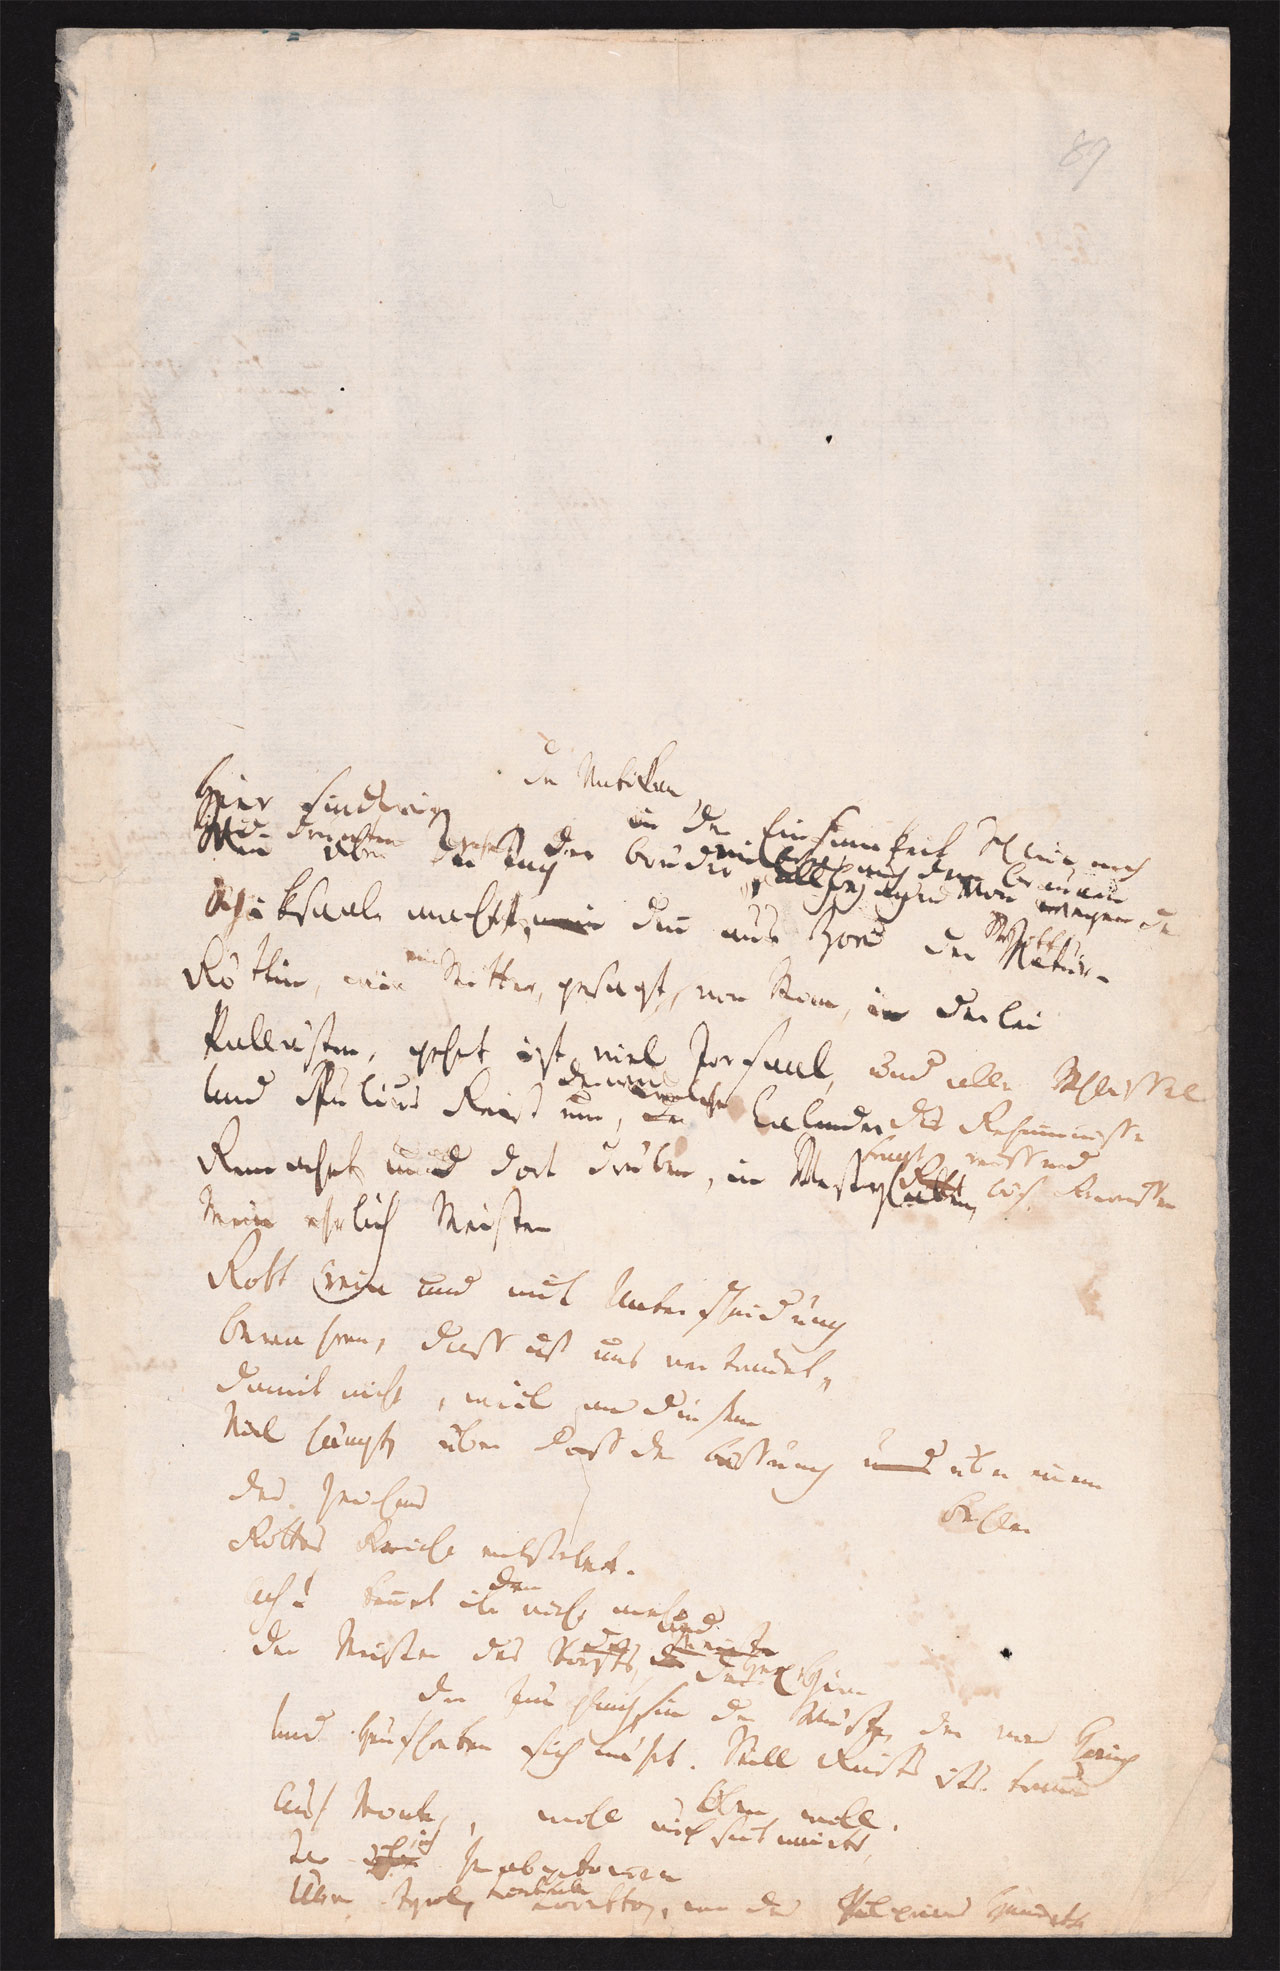 Friedrich Hölderlin, Homburger Folioheft, Seite 89, der Vatikan…, Handschrift